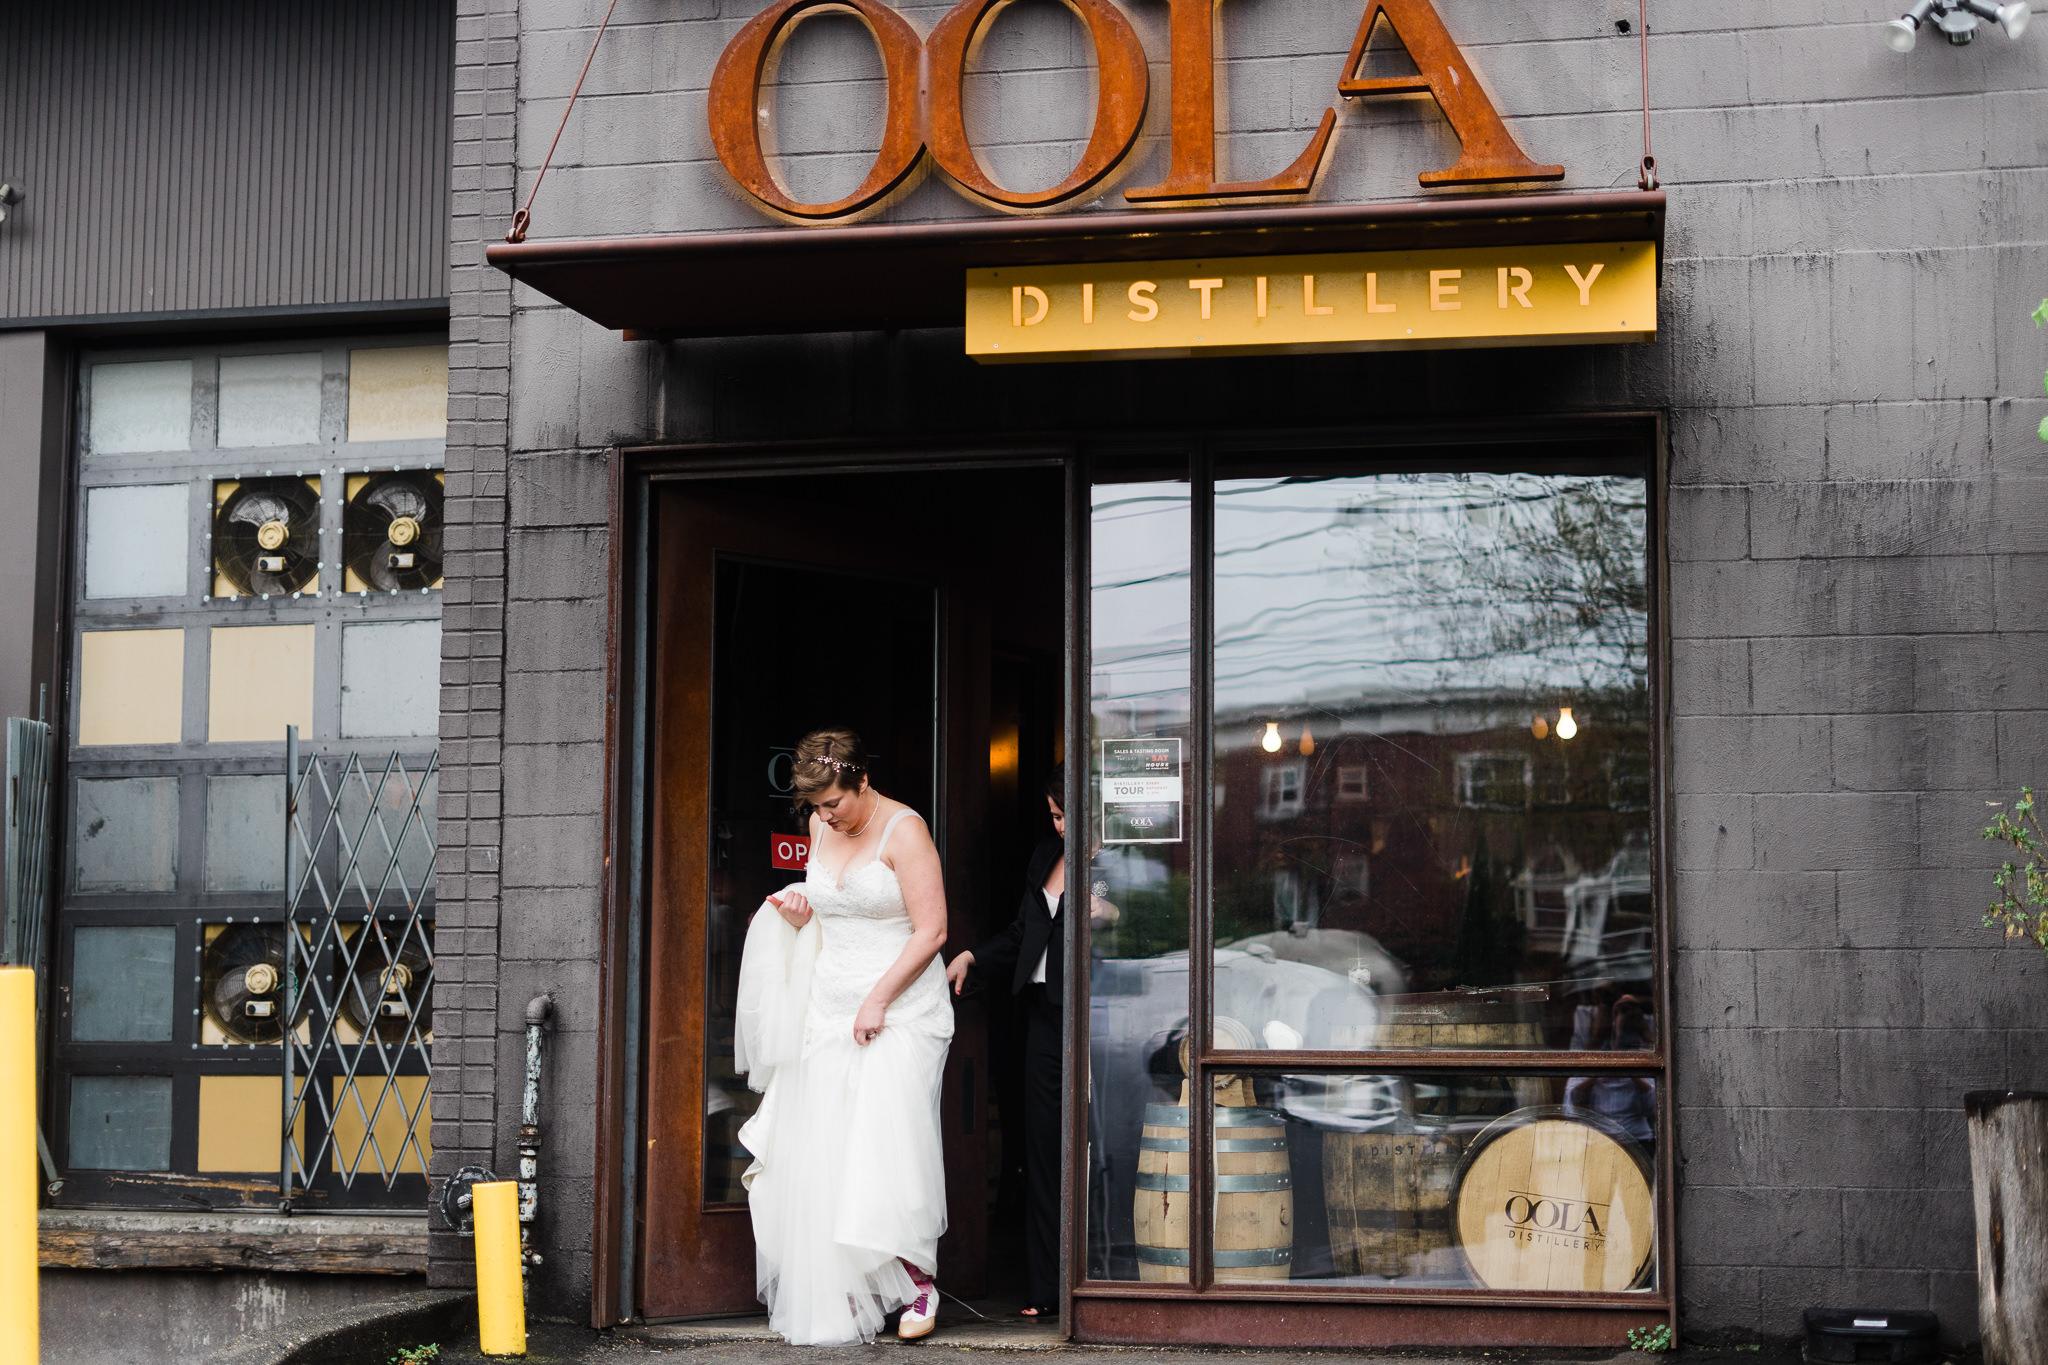 Walk out OOLA Lesbian Gown